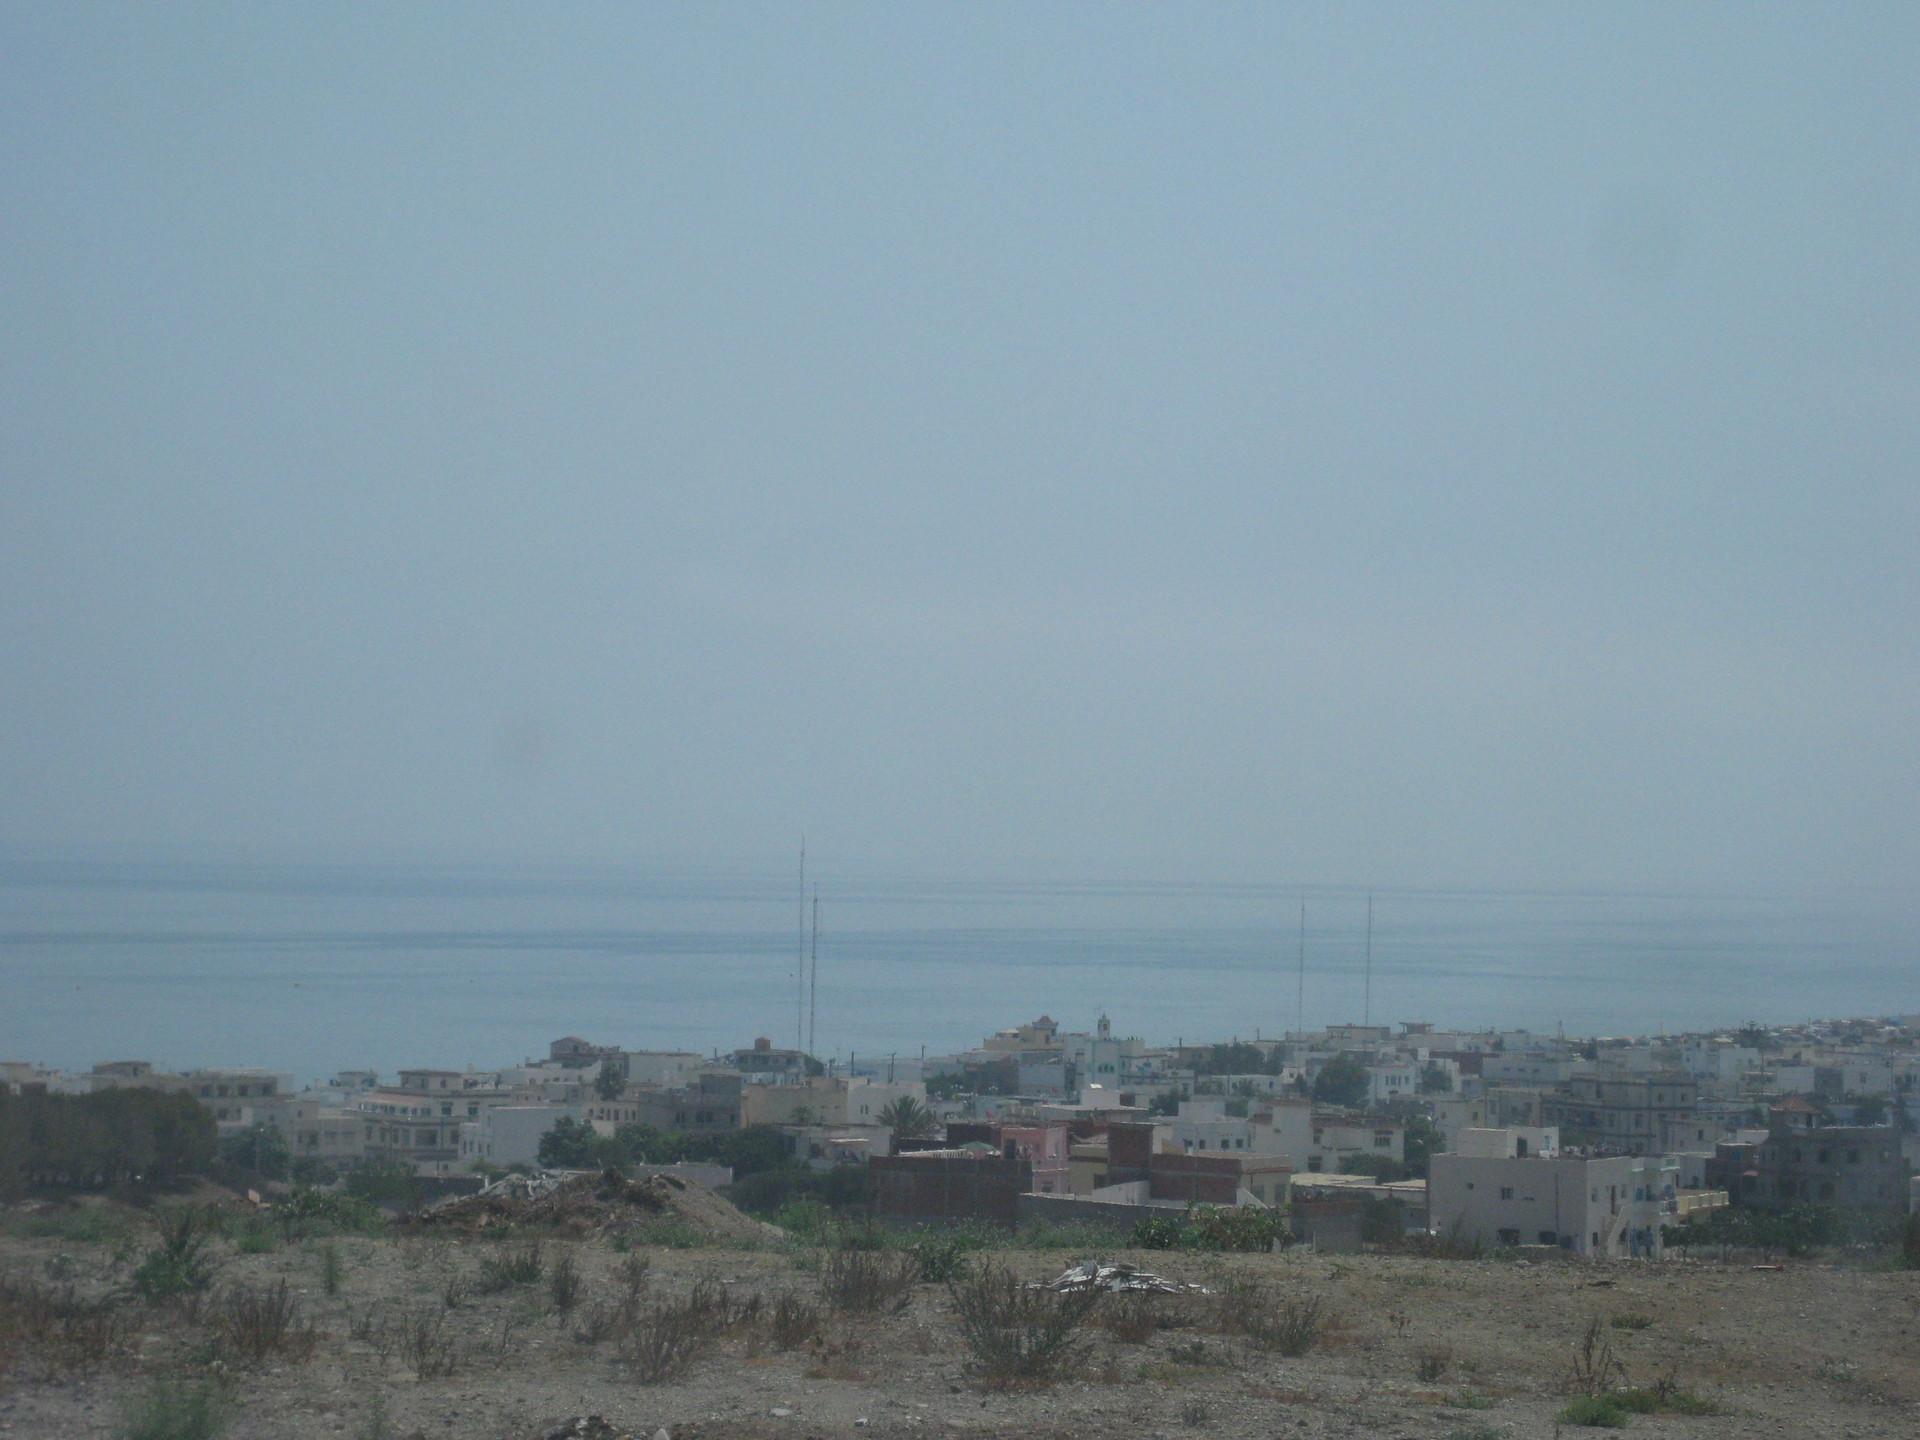 targha-morocco-f3467fbbf77b519e5afe2de1e